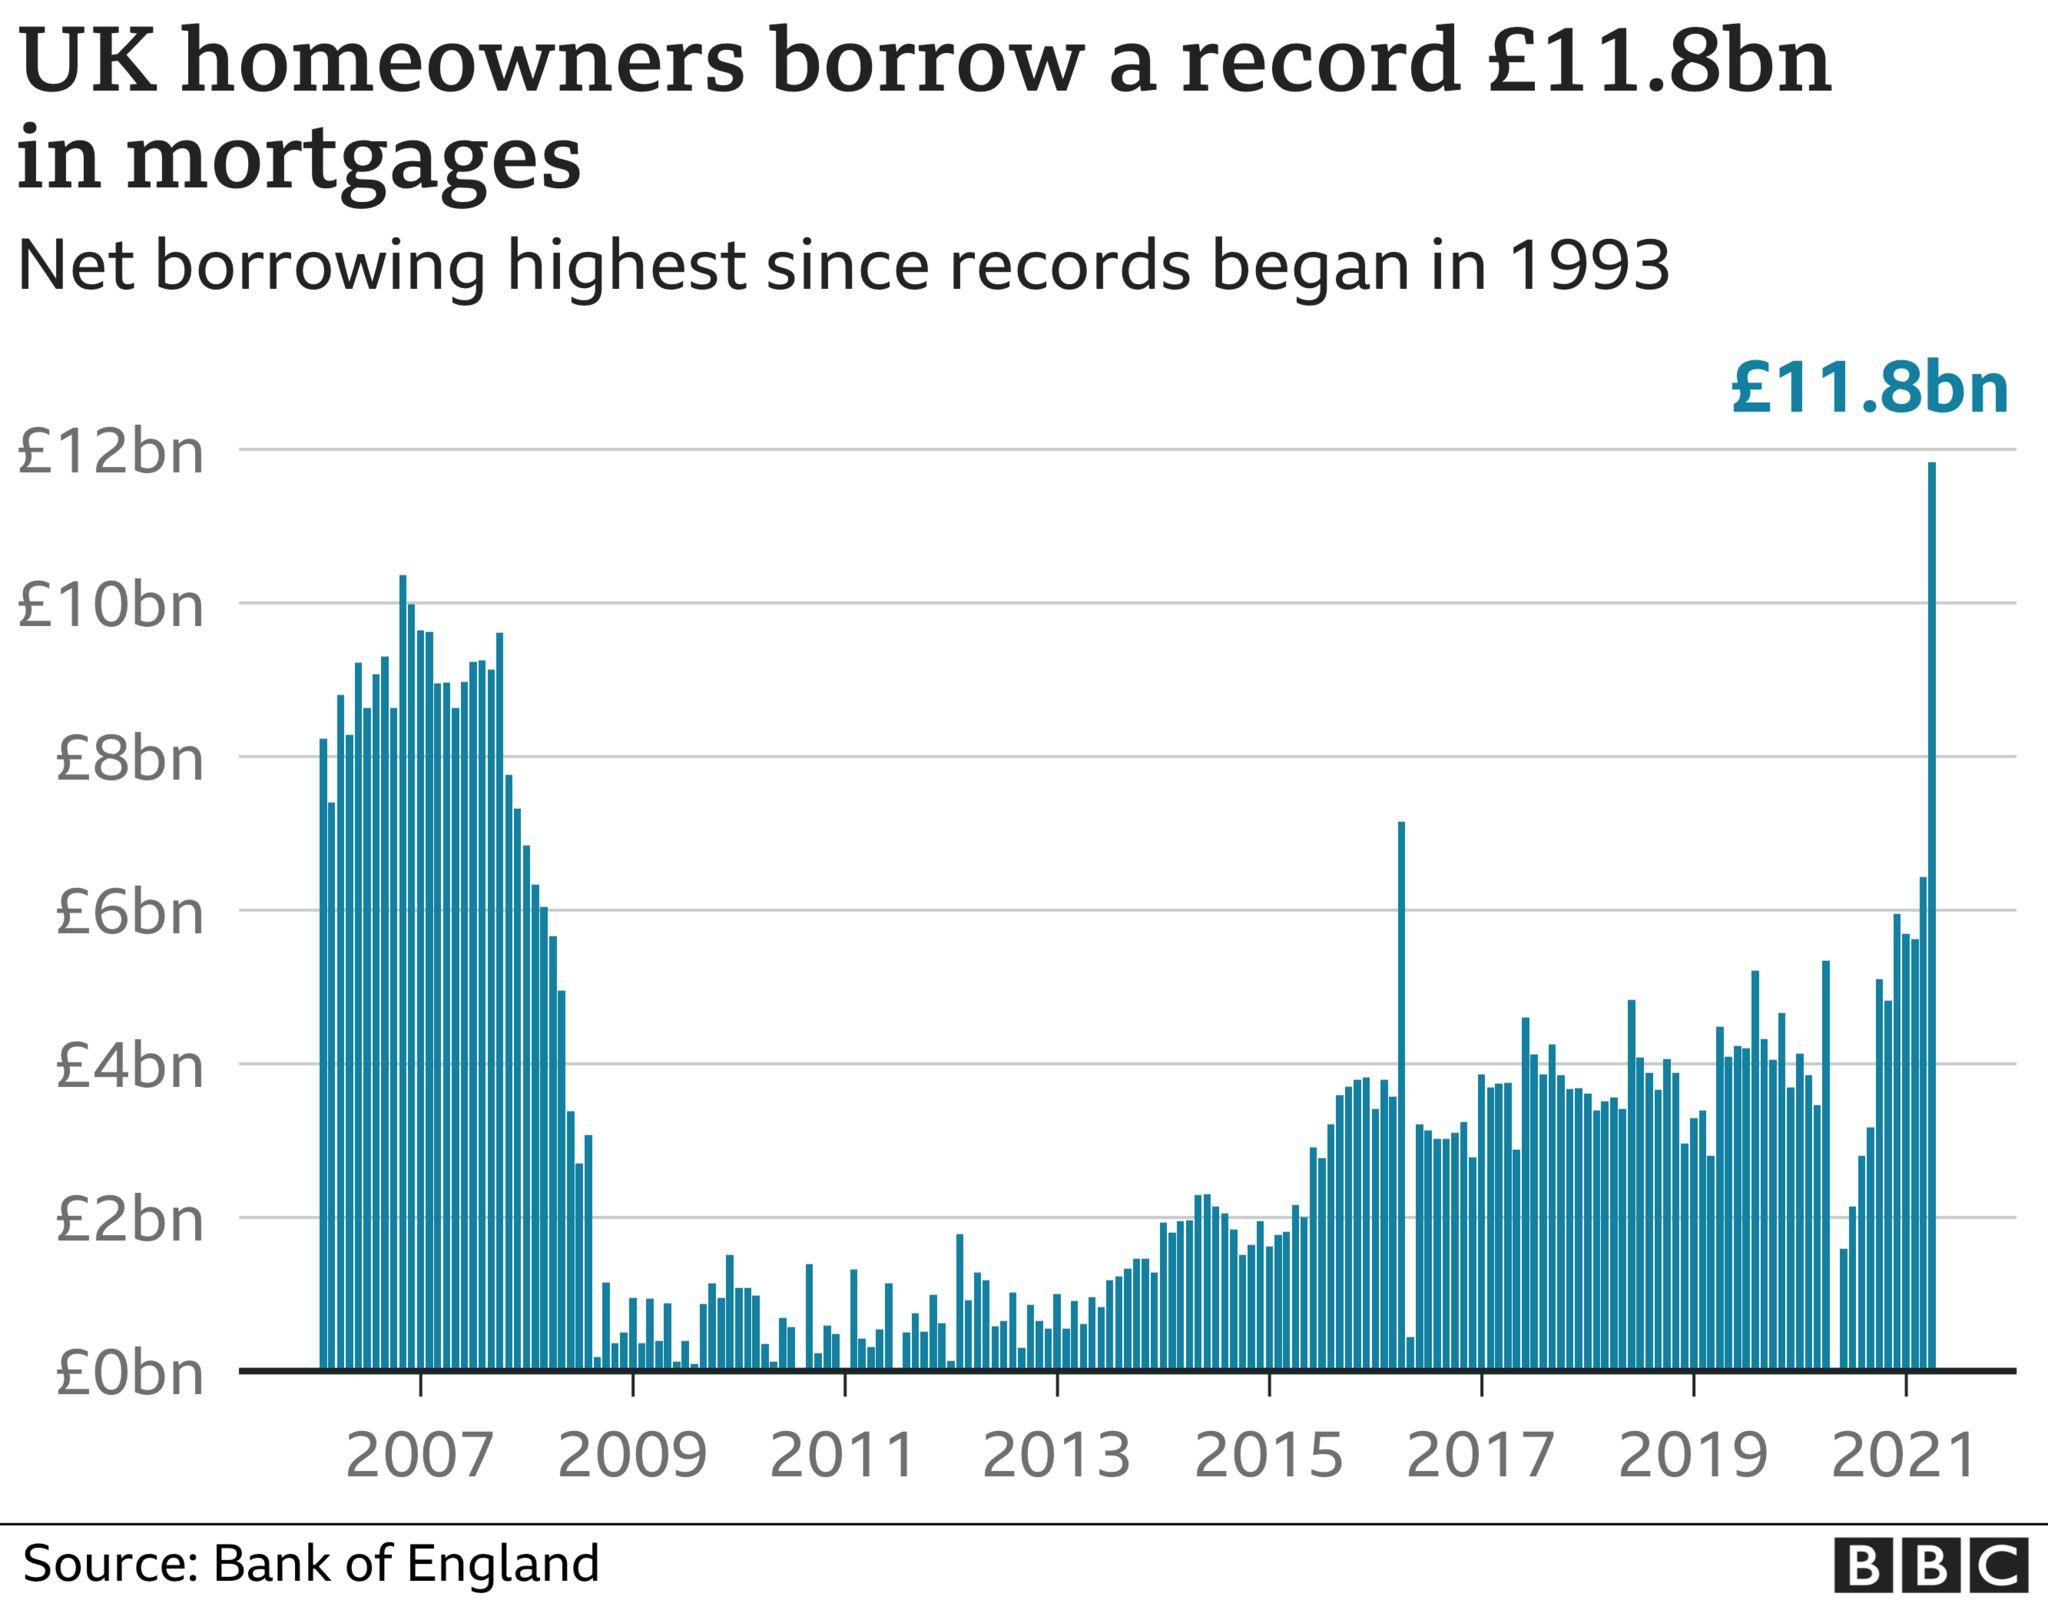 Mortgage lending since 1993